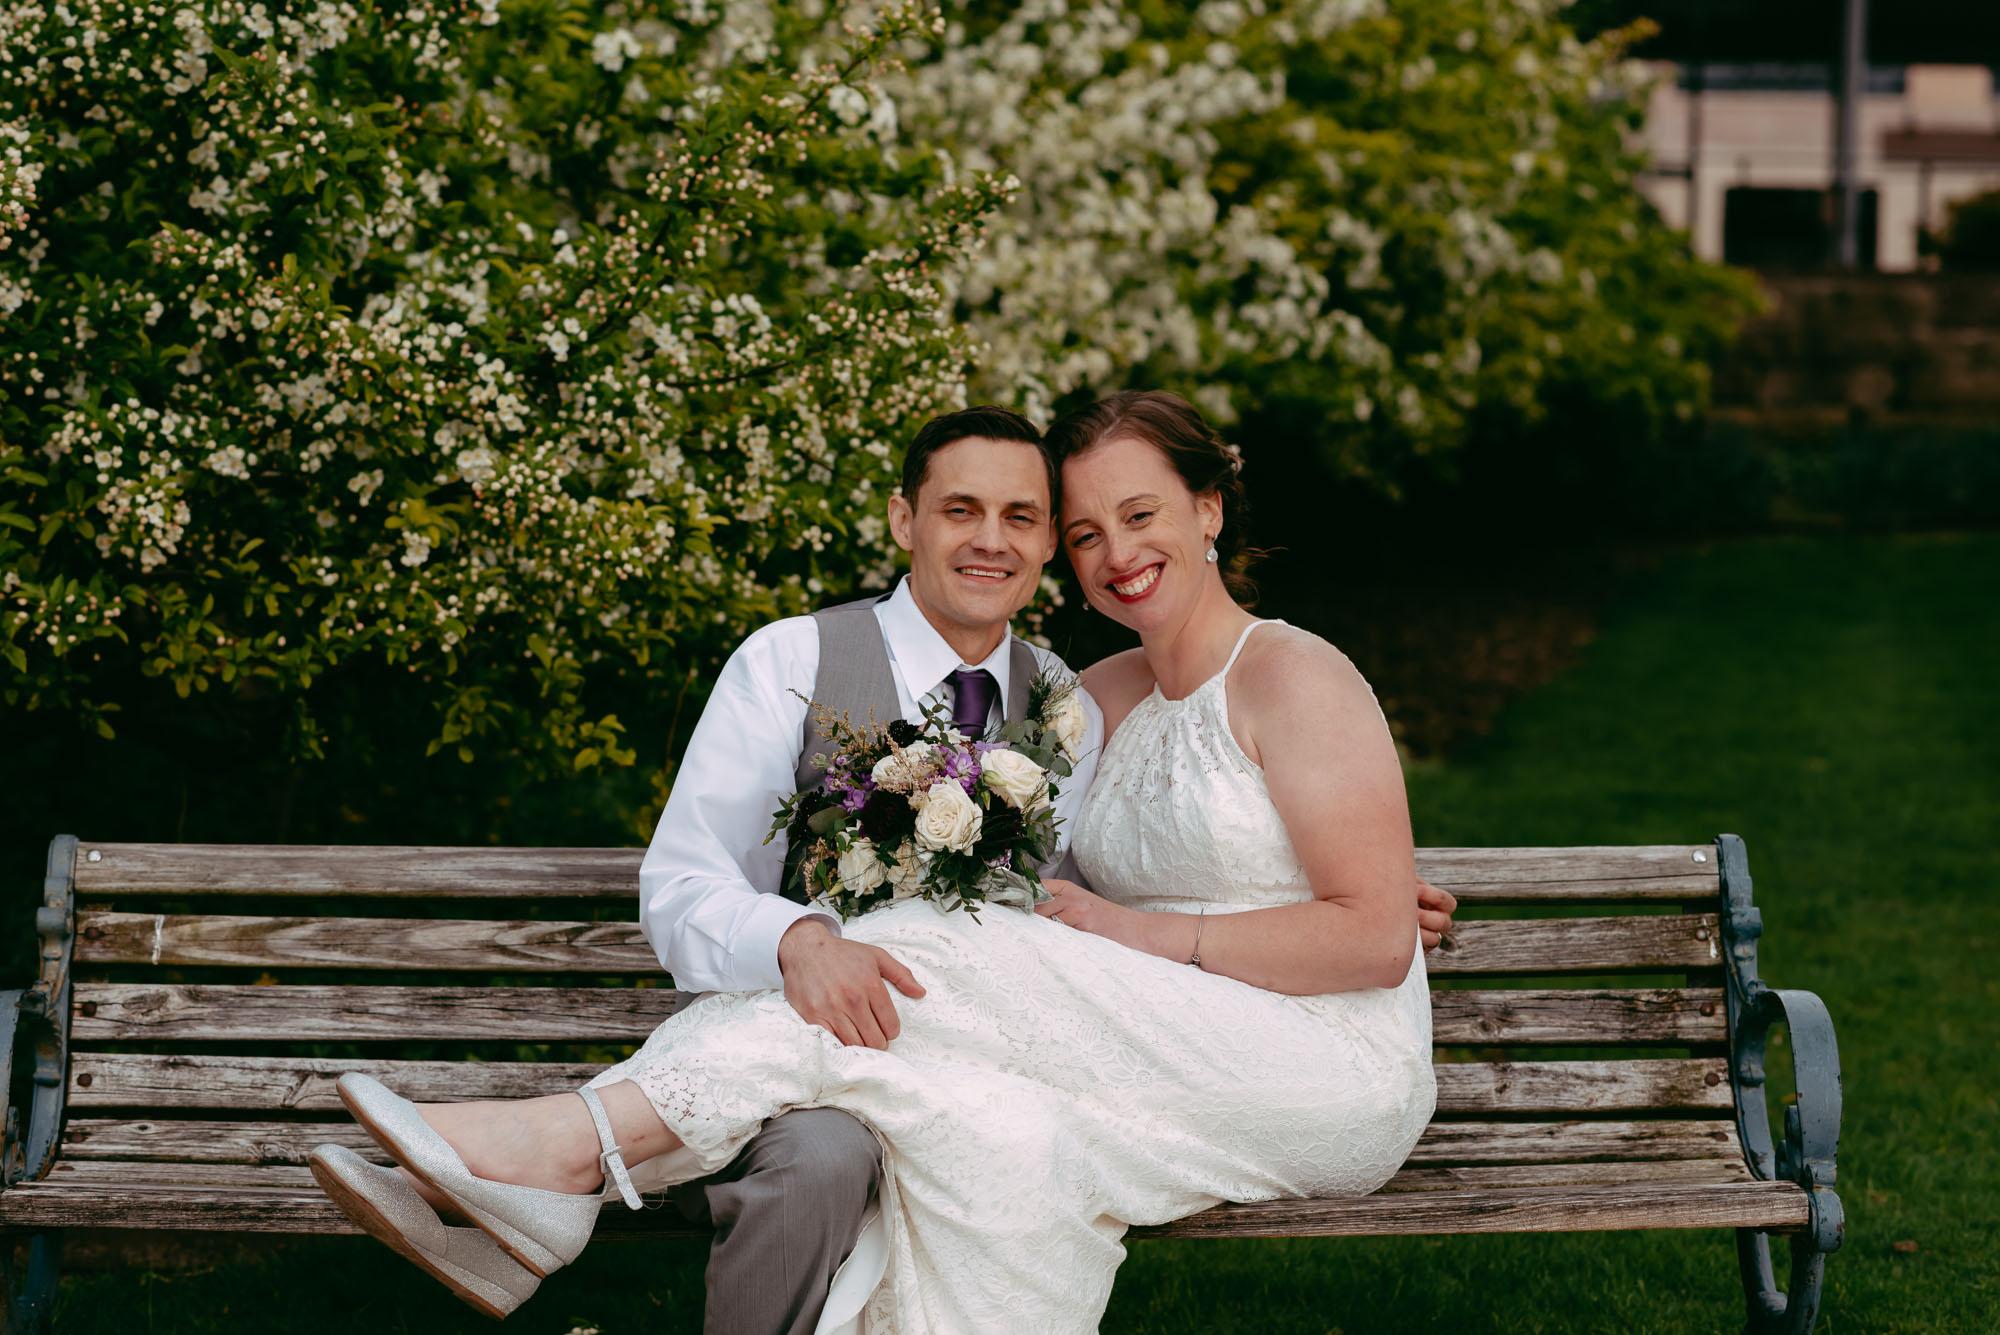 prairie-street-brewhouse-wedding-Rockford-IL-wedding-photographers-202.jpg